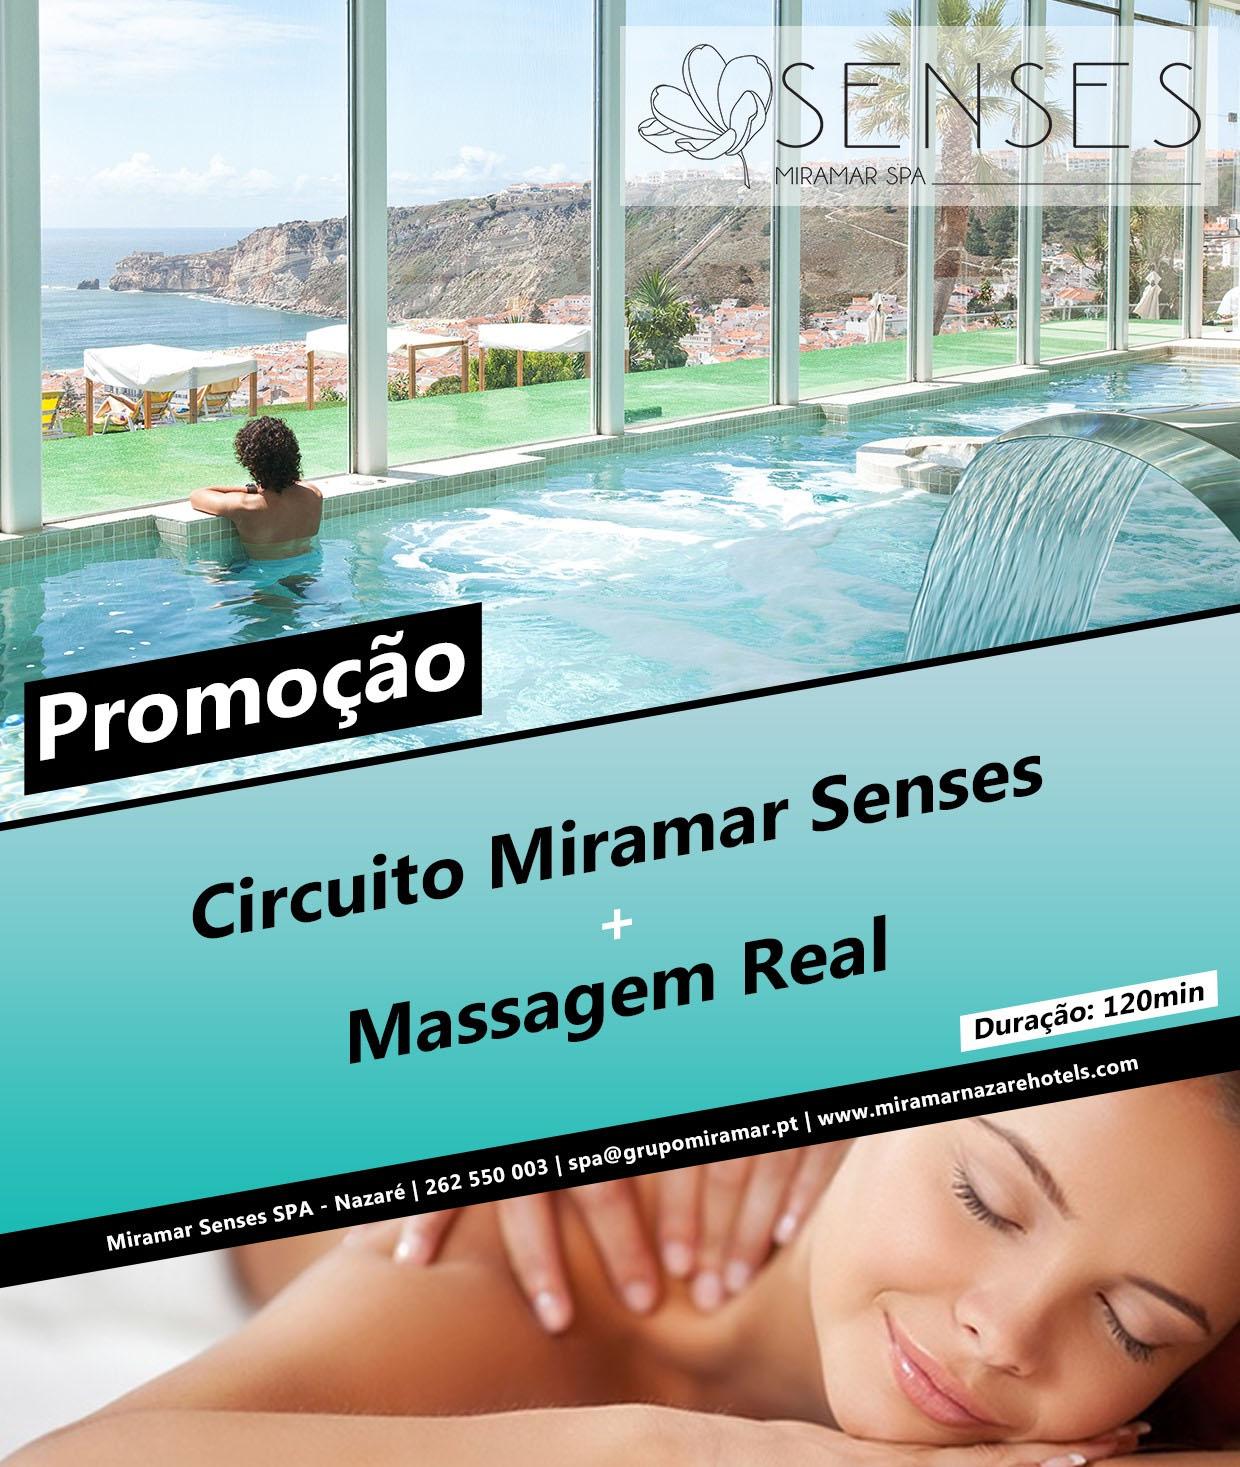 Circuito Miramar Senses SPA + Massagem Real